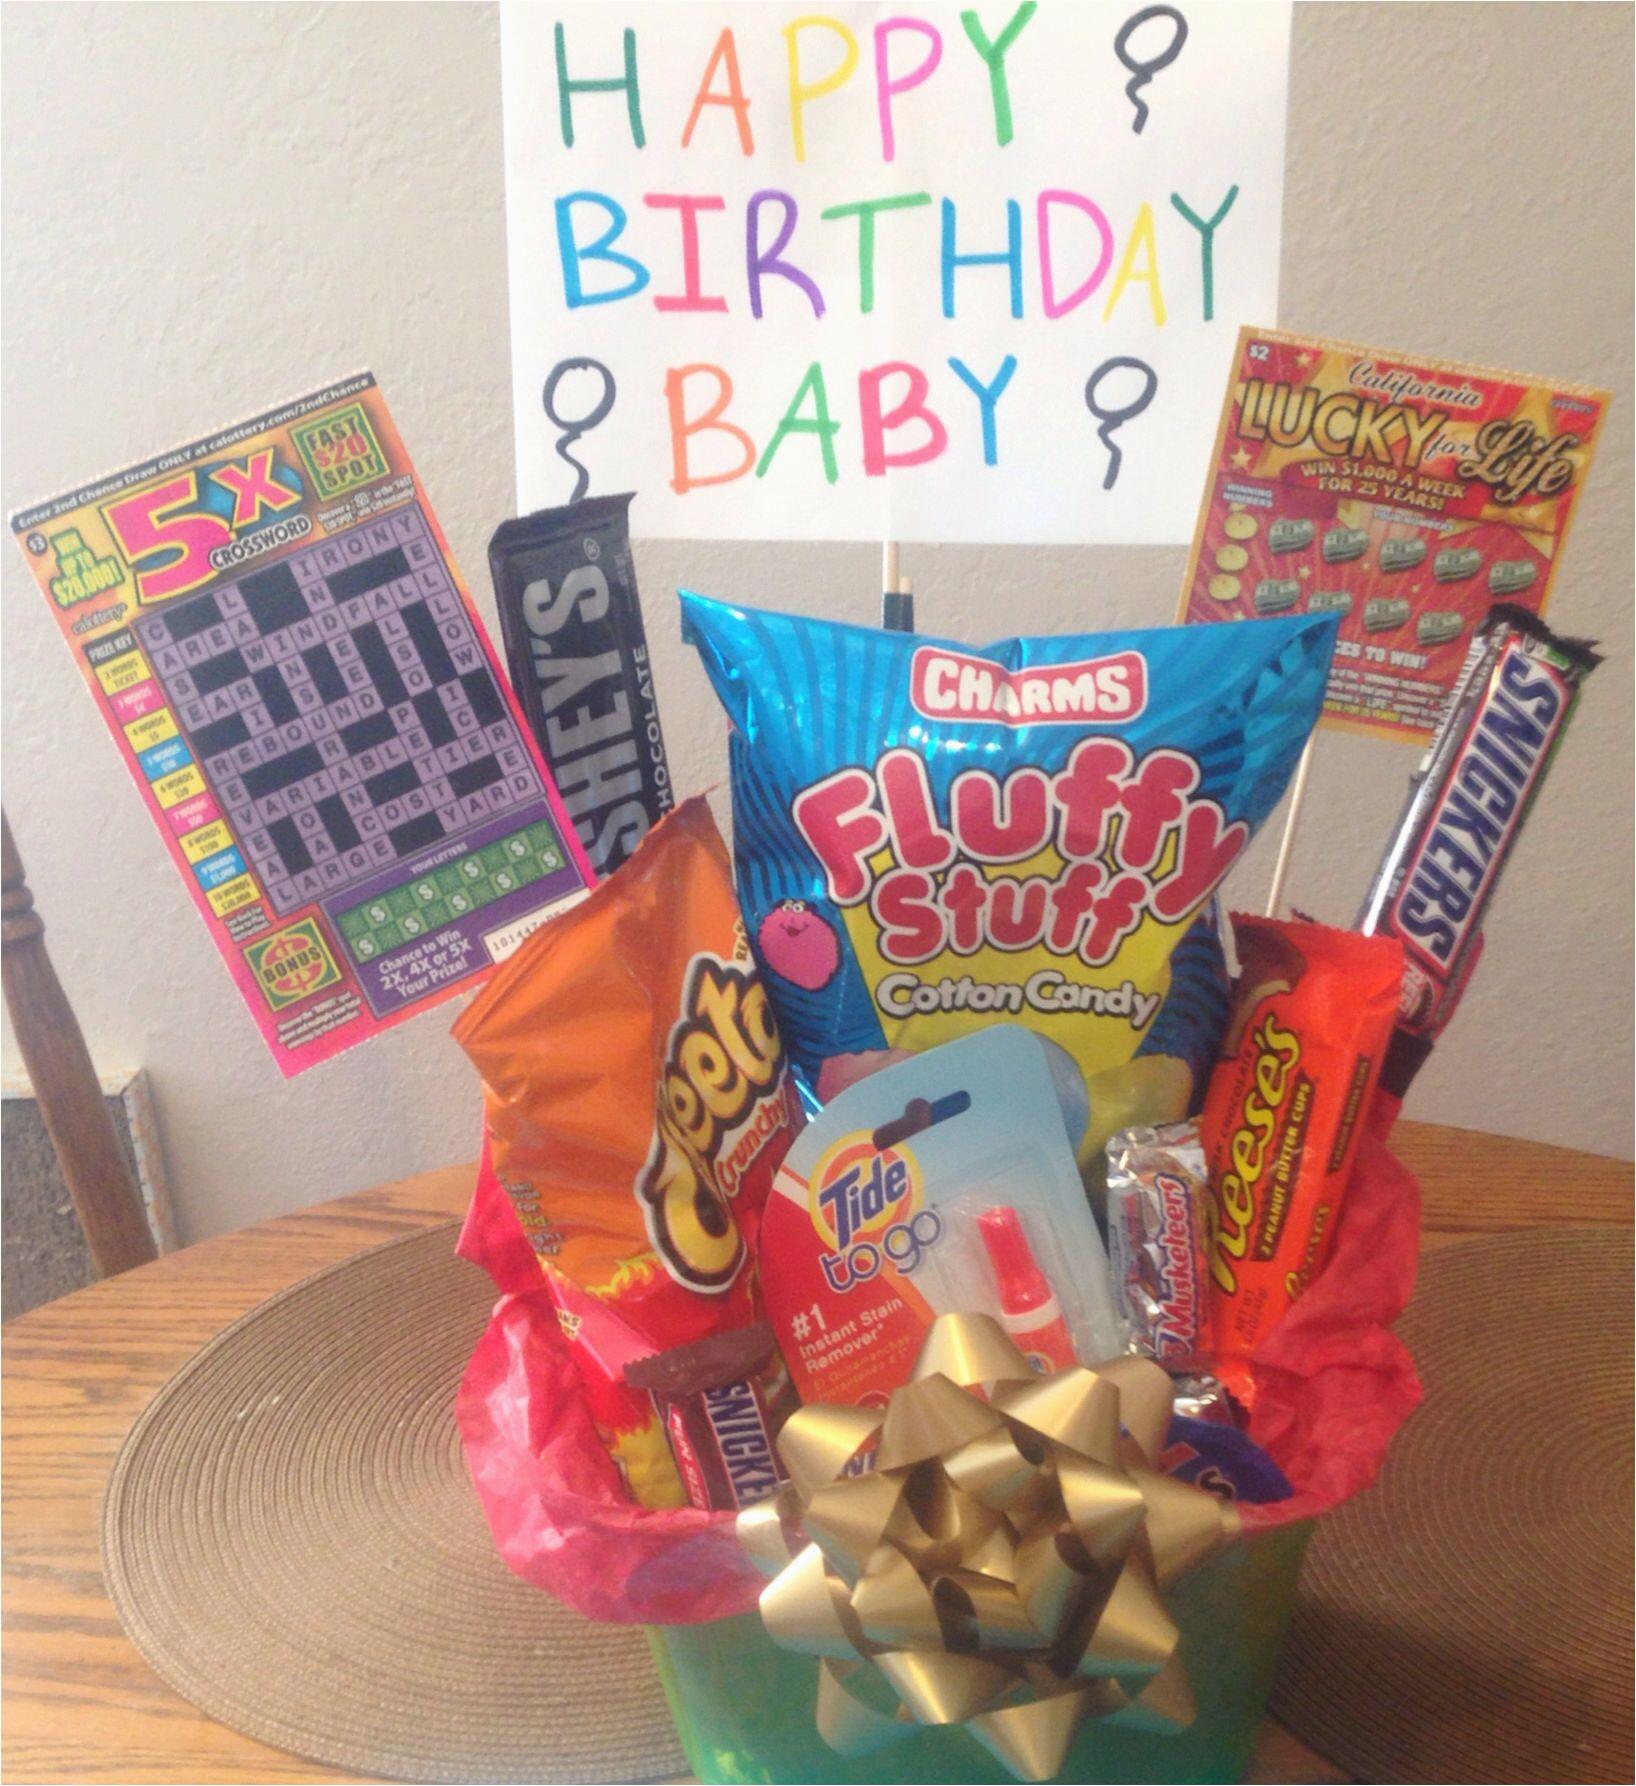 gift ideas for boyfriend birthday 21